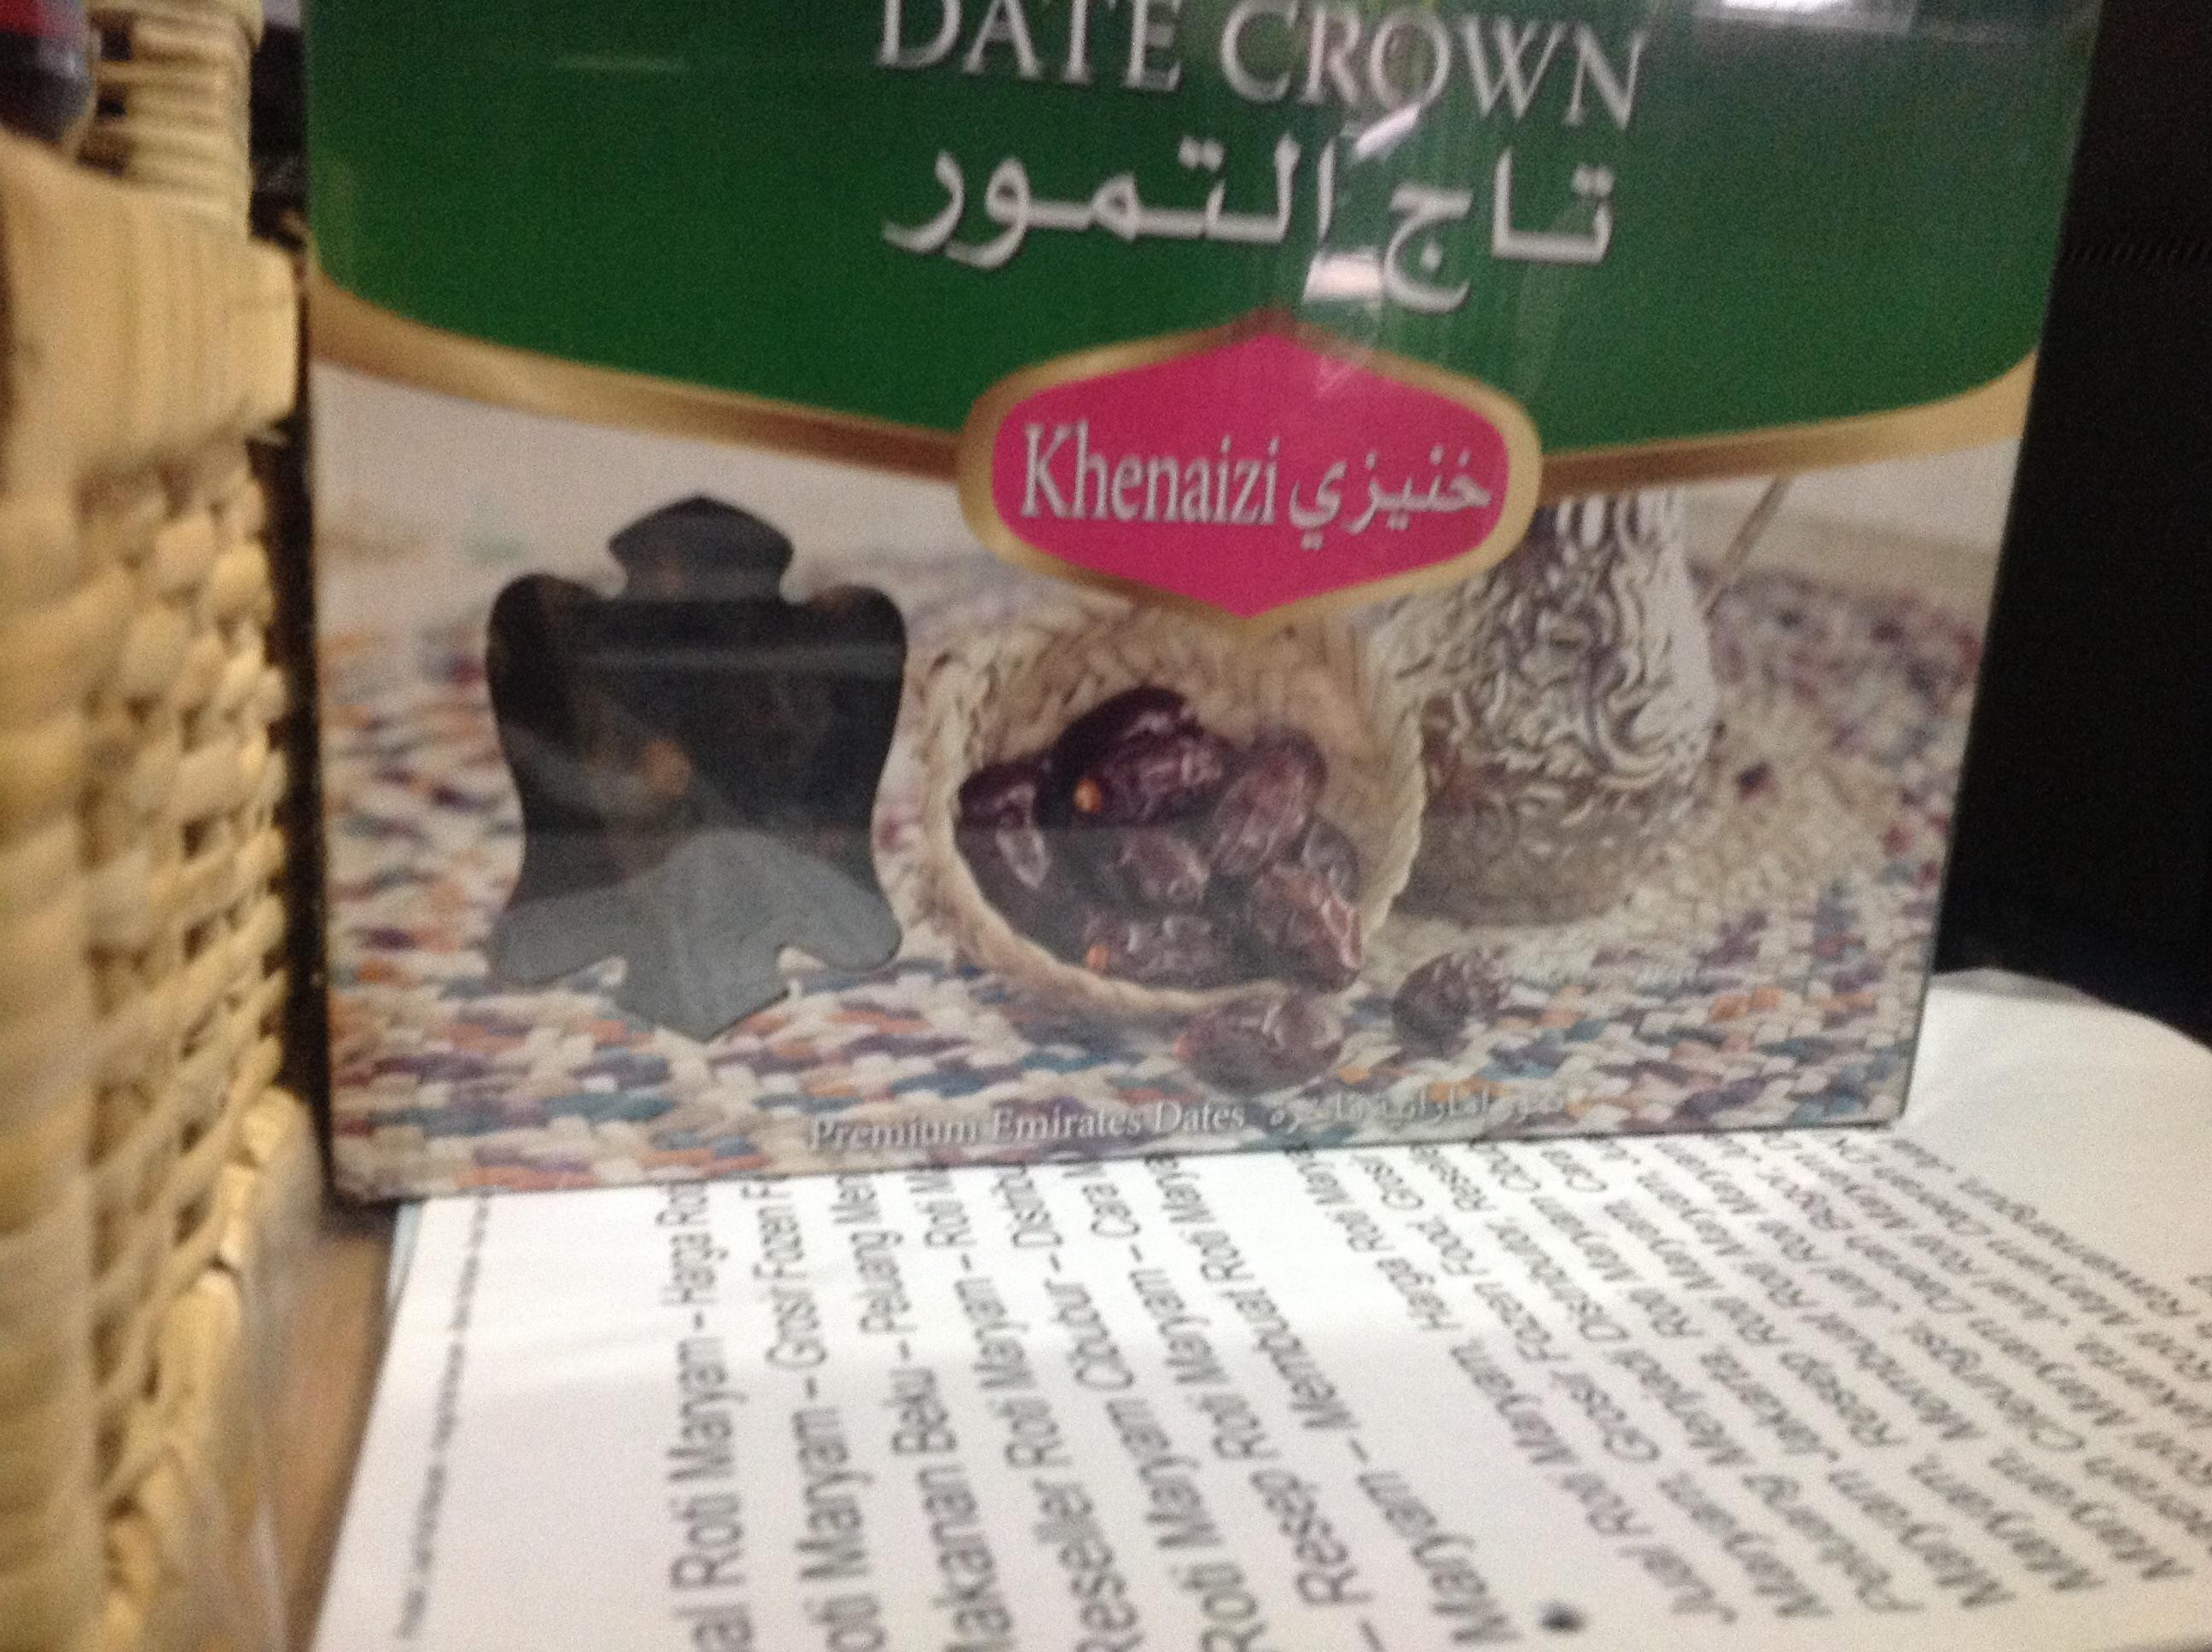 Kurma Kheinaizi Dan Khalas Jual Roti Maryam Harga Date Crown Khenaizi 1 Kg Emirat Kheinizi Dus Isi 10 Pack 1kg